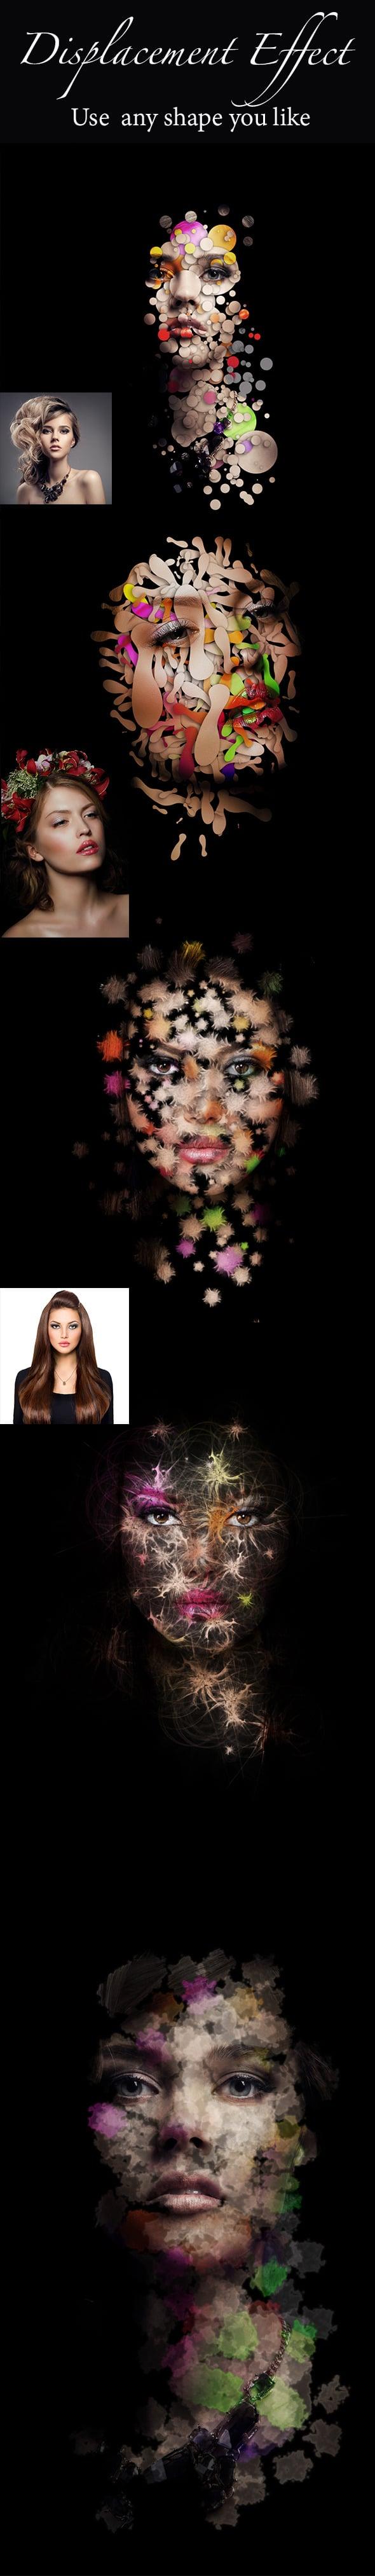 63 VSCO Photoshop Actions: Artistic Actions Bundle - just $9 - 7 2